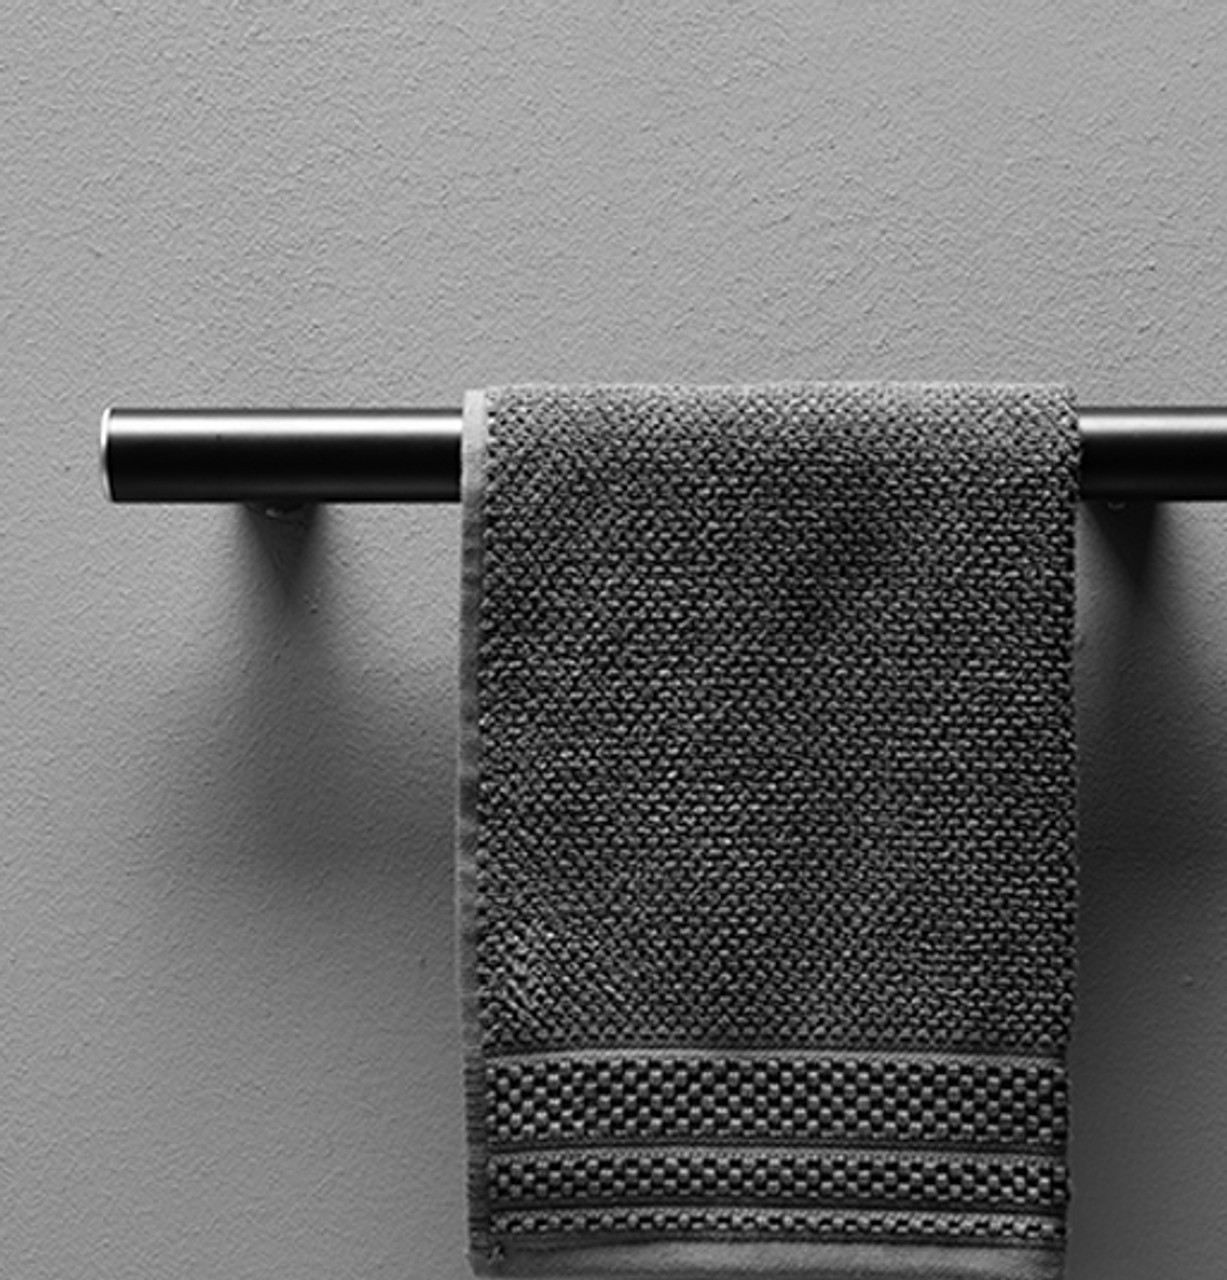 "35"" Straight Black Shower Grab Bar, ADA Compliant Handle Grab Bars for Bathroom | Wall Mount Grab Bar, Safety Hand Rail Support - Senior Assist Bath Handle"